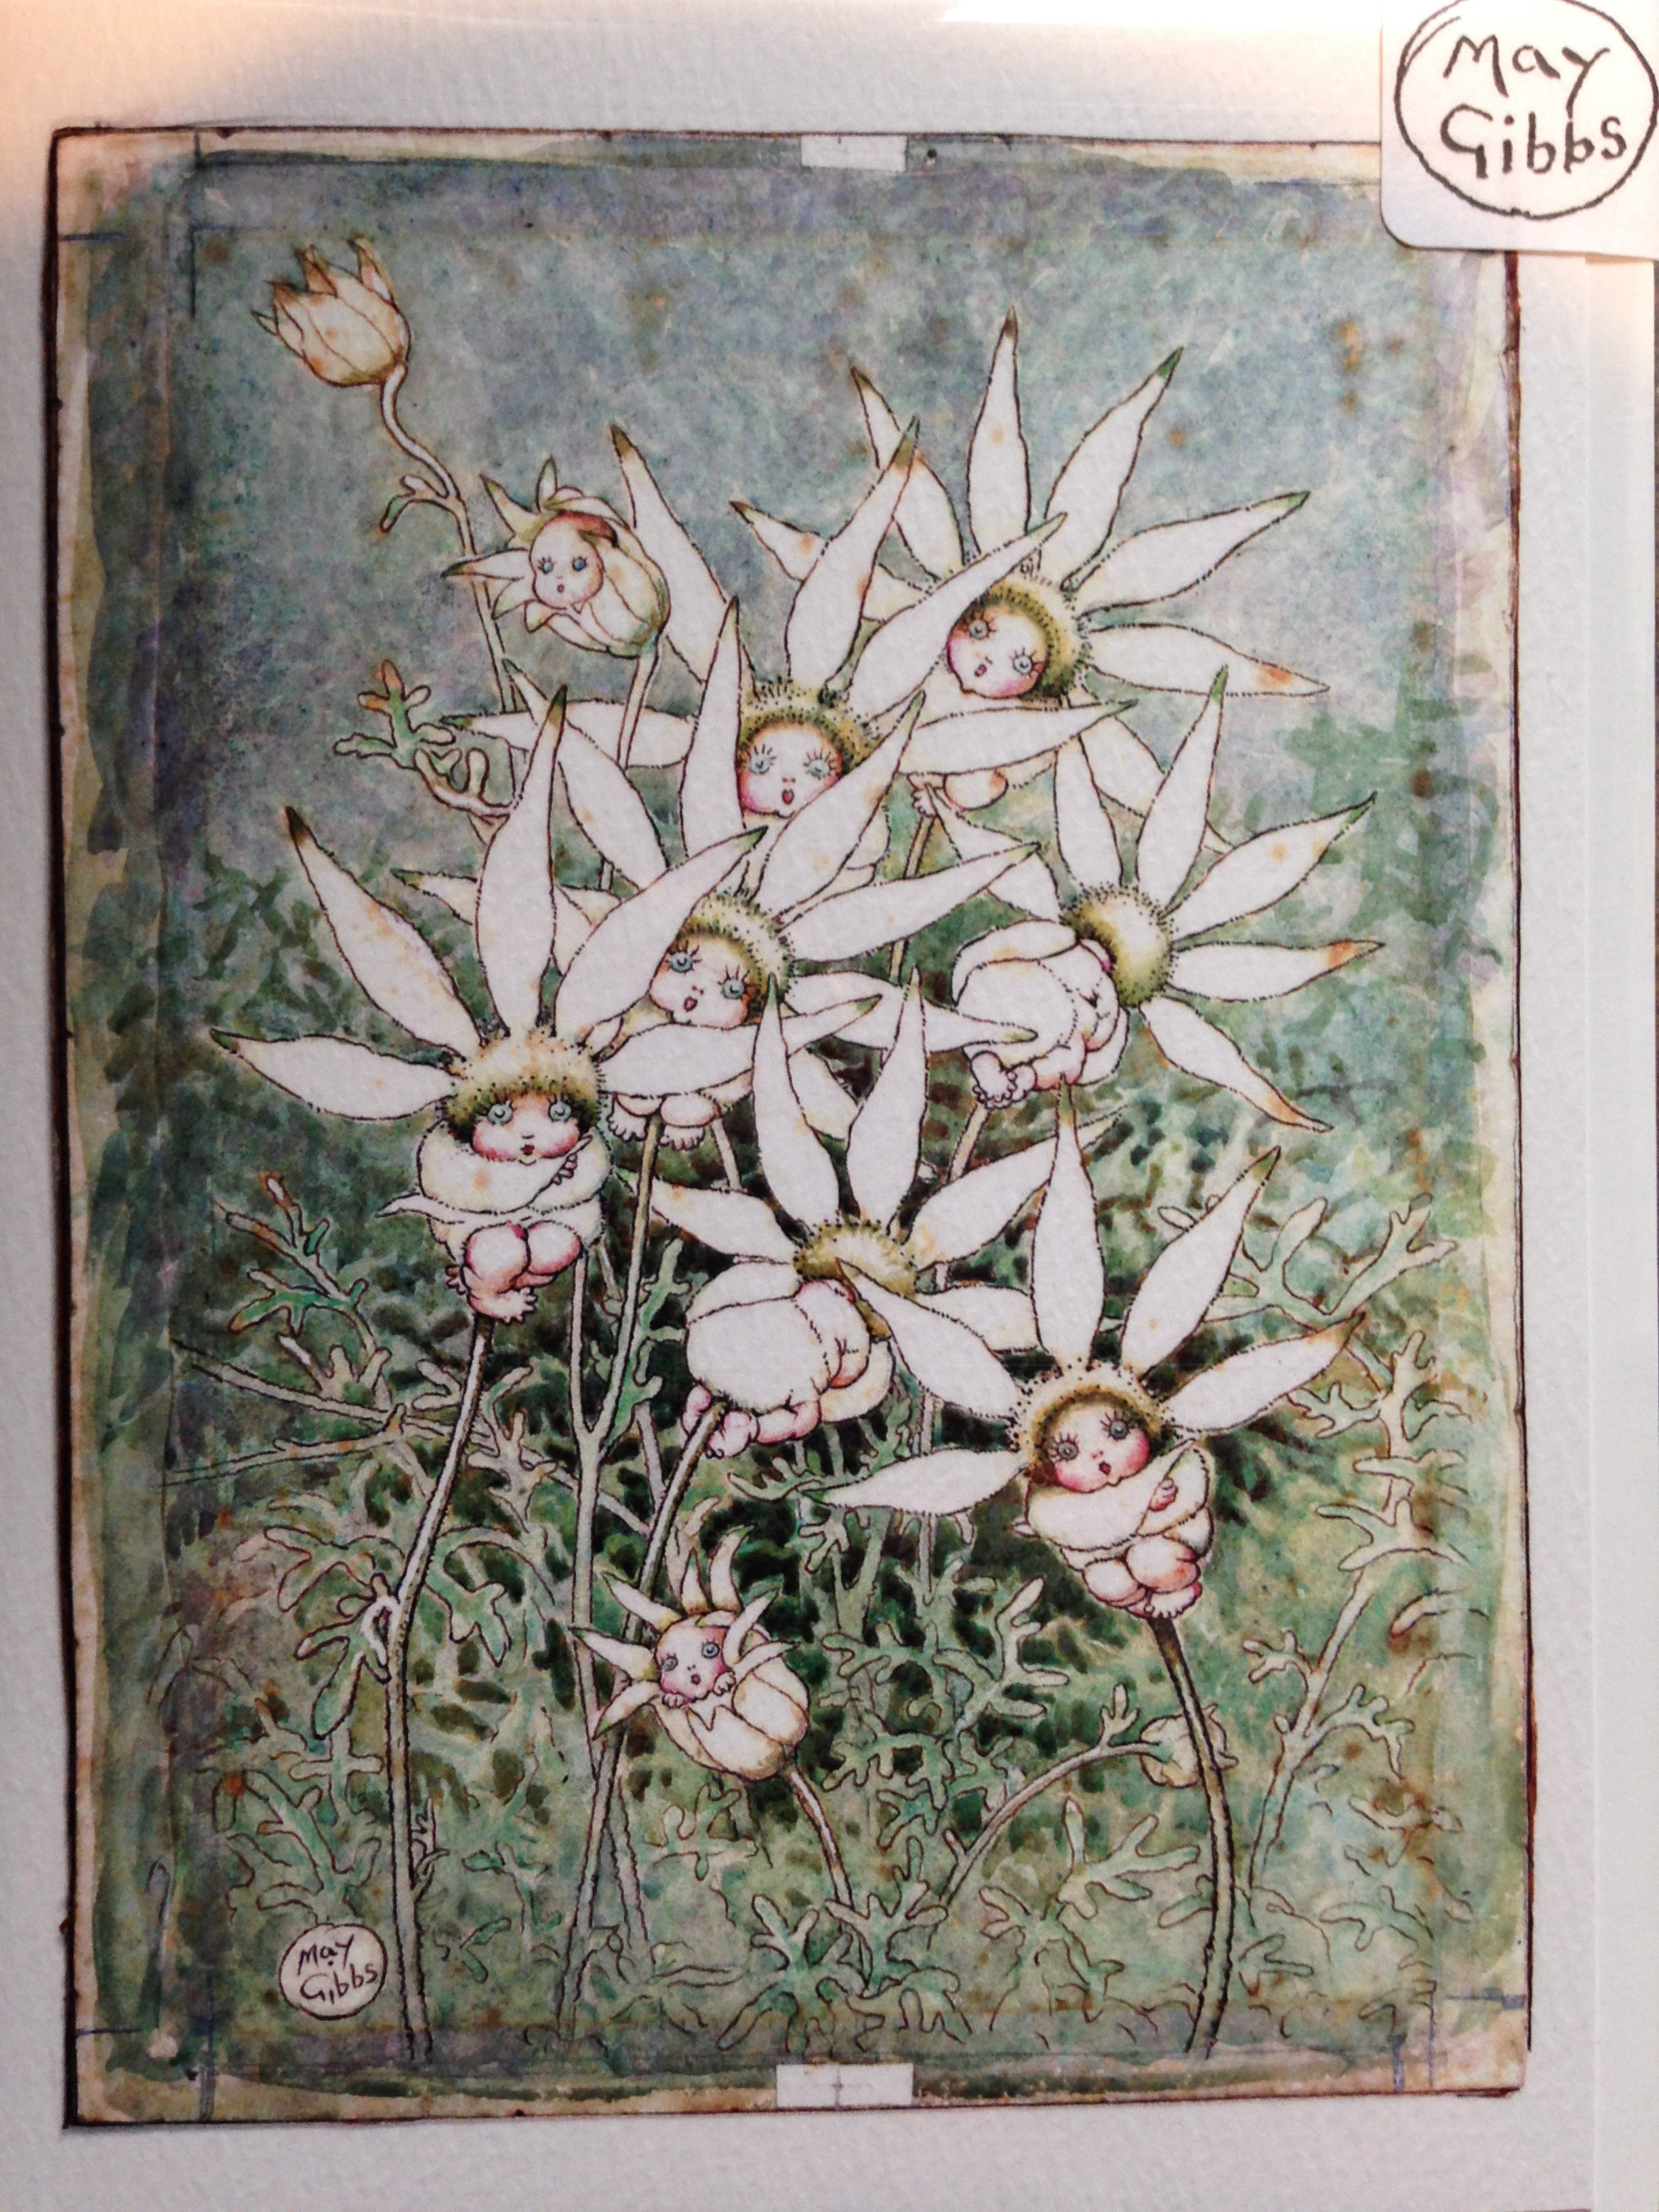 May Gibbs' beautiful artwork.